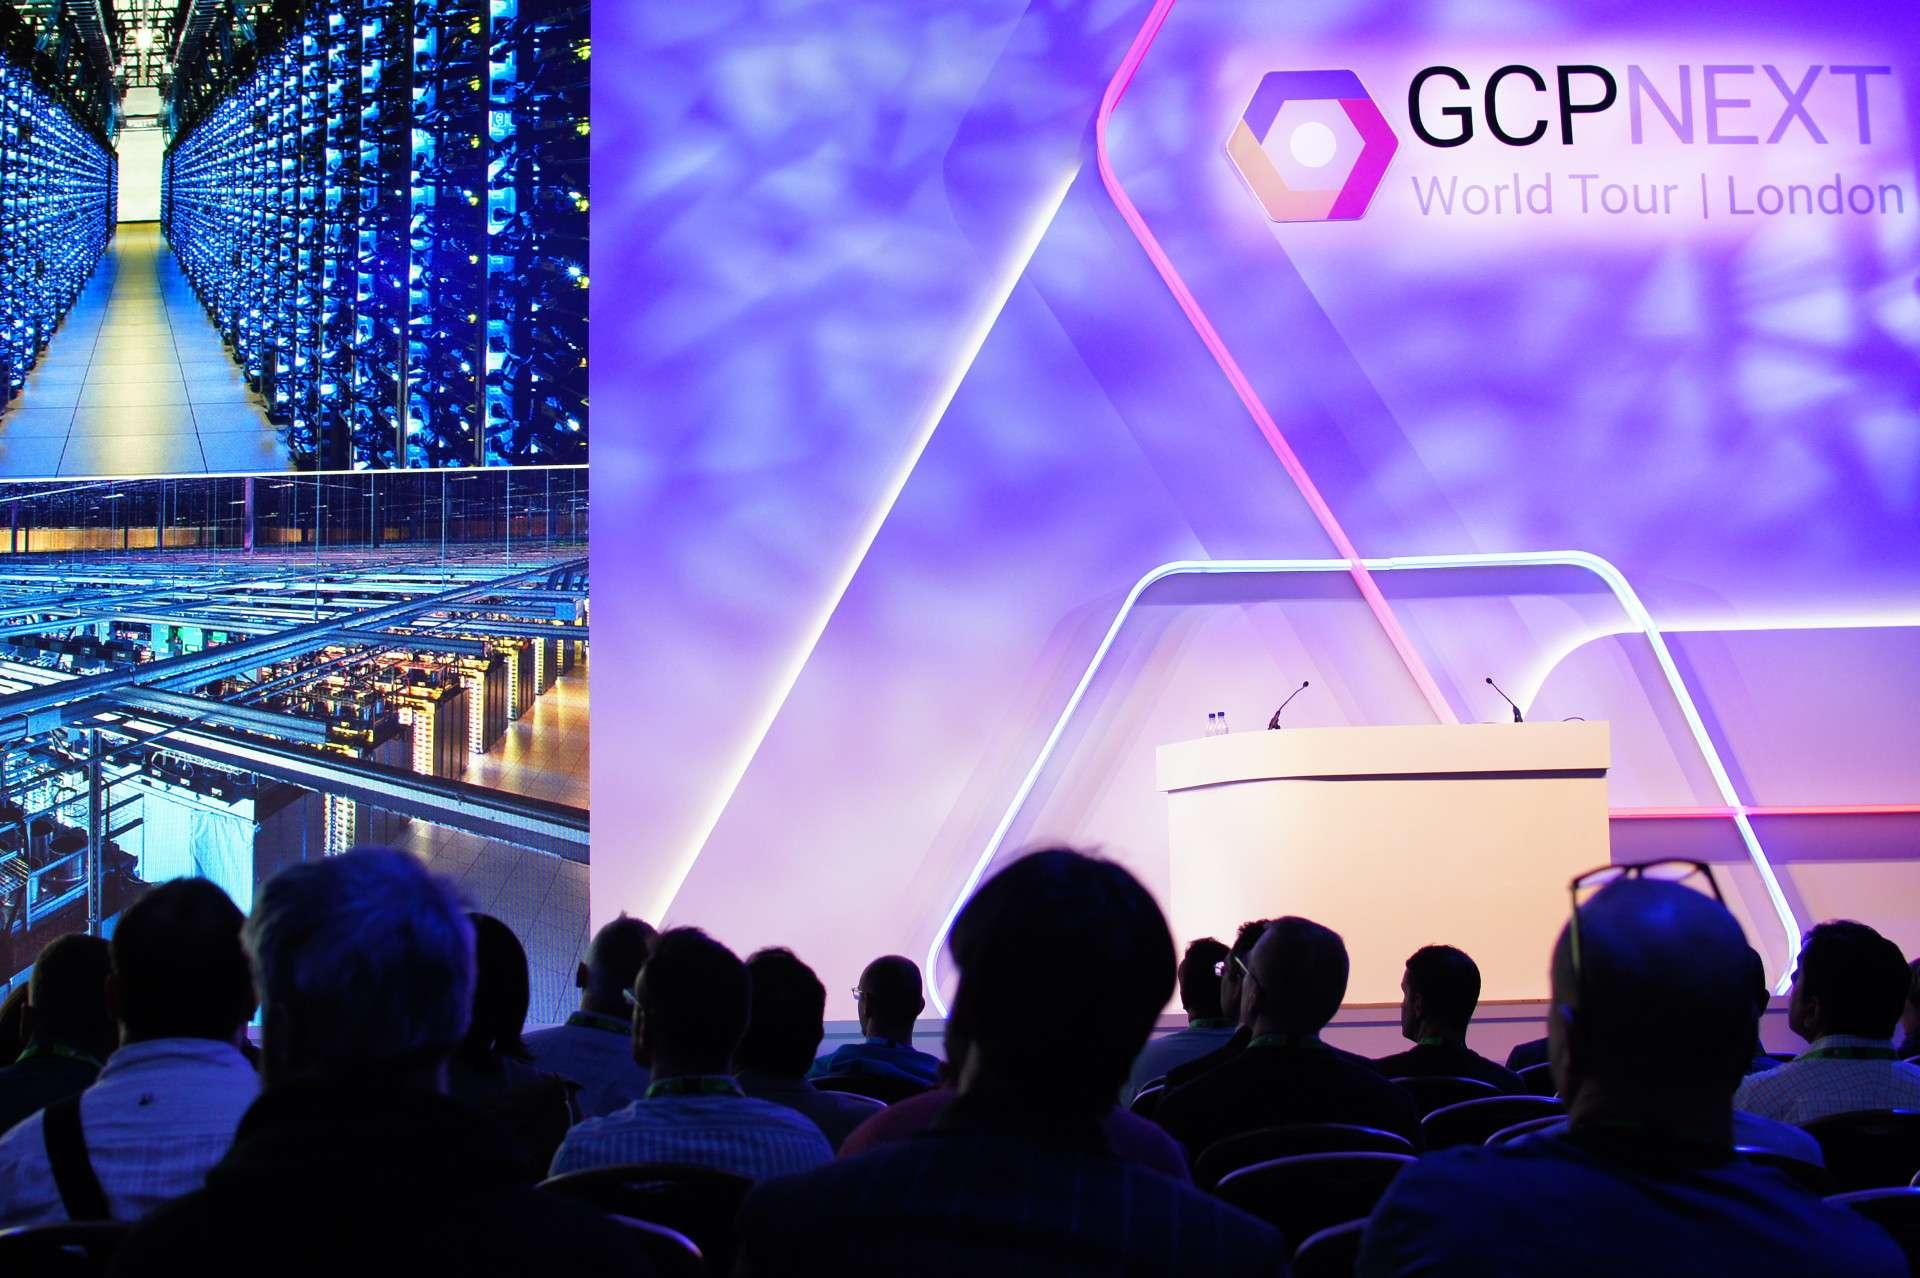 GCP audience